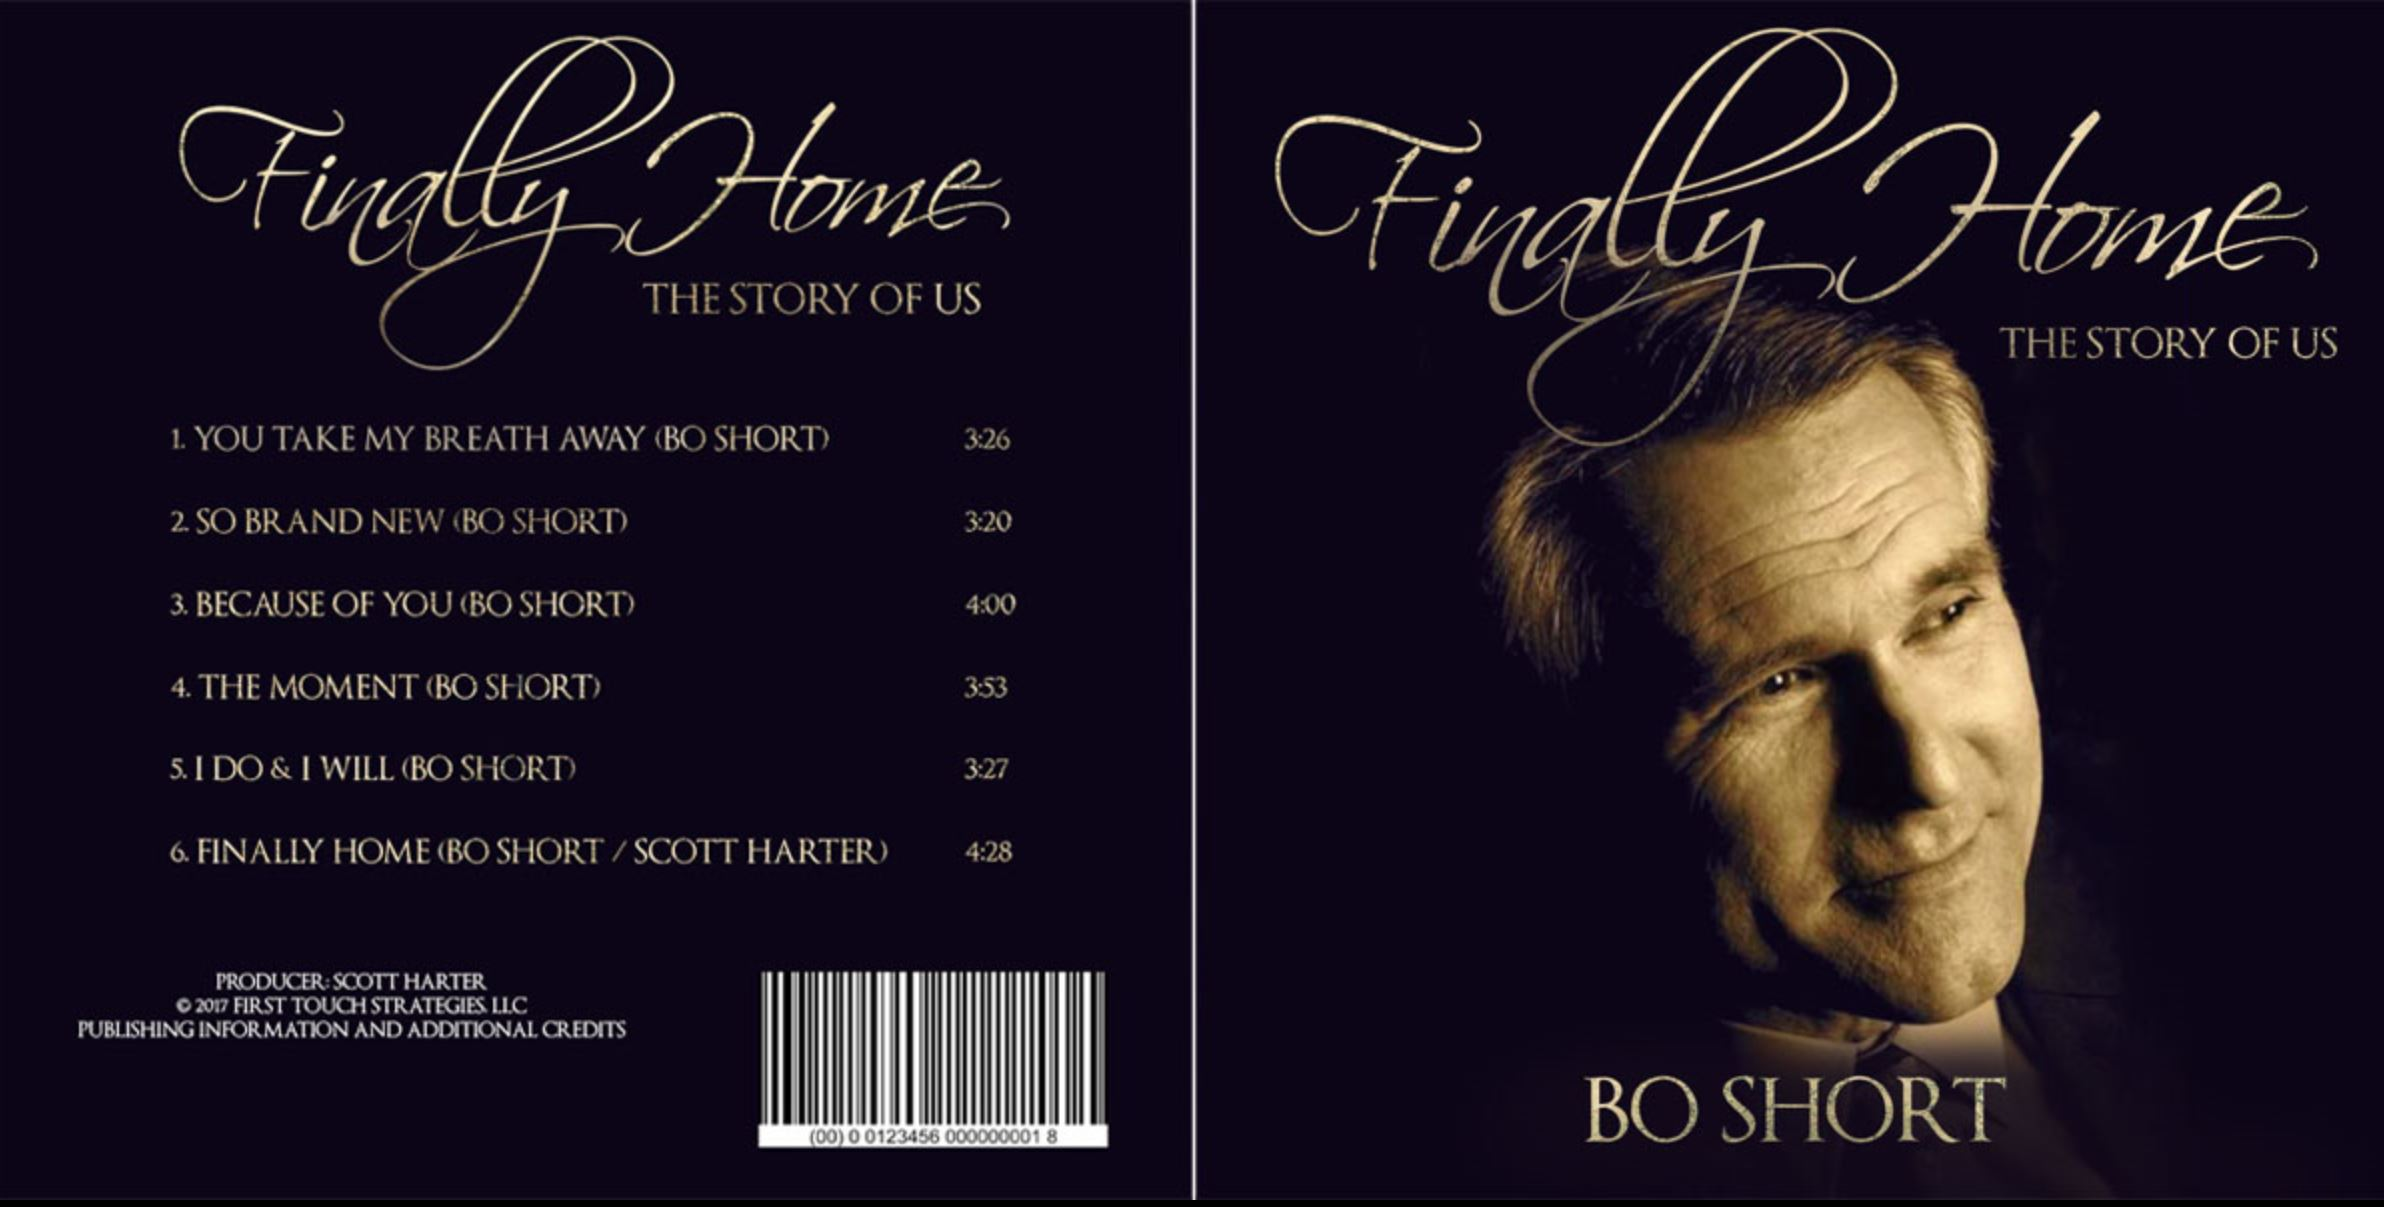 Traditionel Sympatisch Music Download Cd Cover Design Für Bo Short